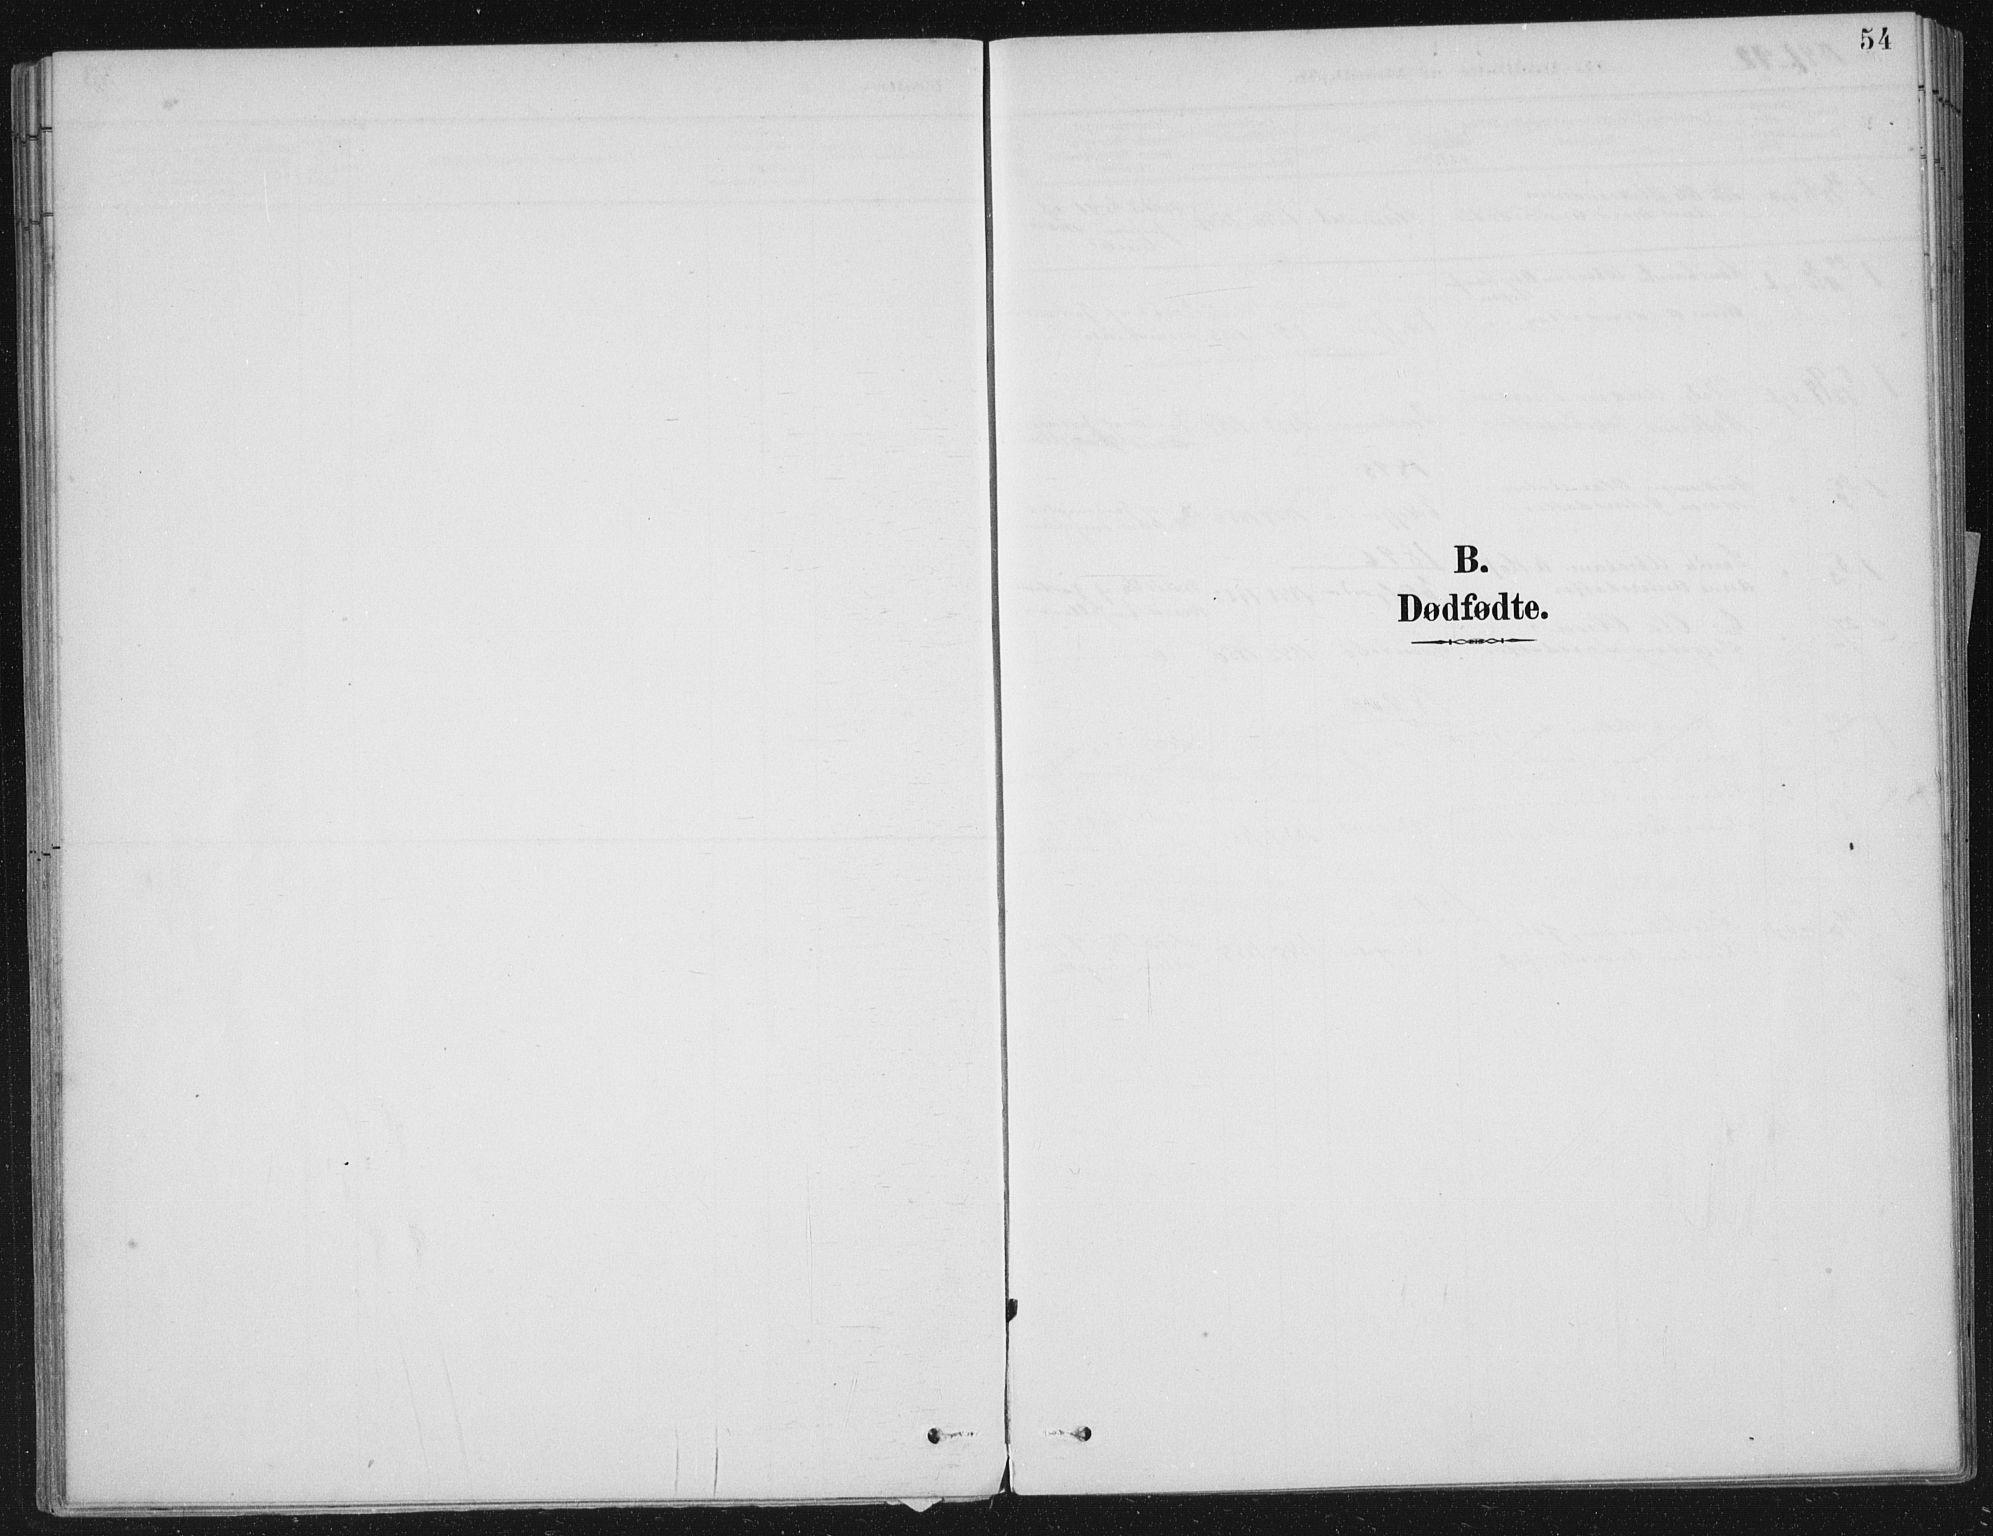 SAB, Kinn sokneprestembete, H/Haa/Haae/L0001: Ministerialbok nr. E 1, 1890-1916, s. 54